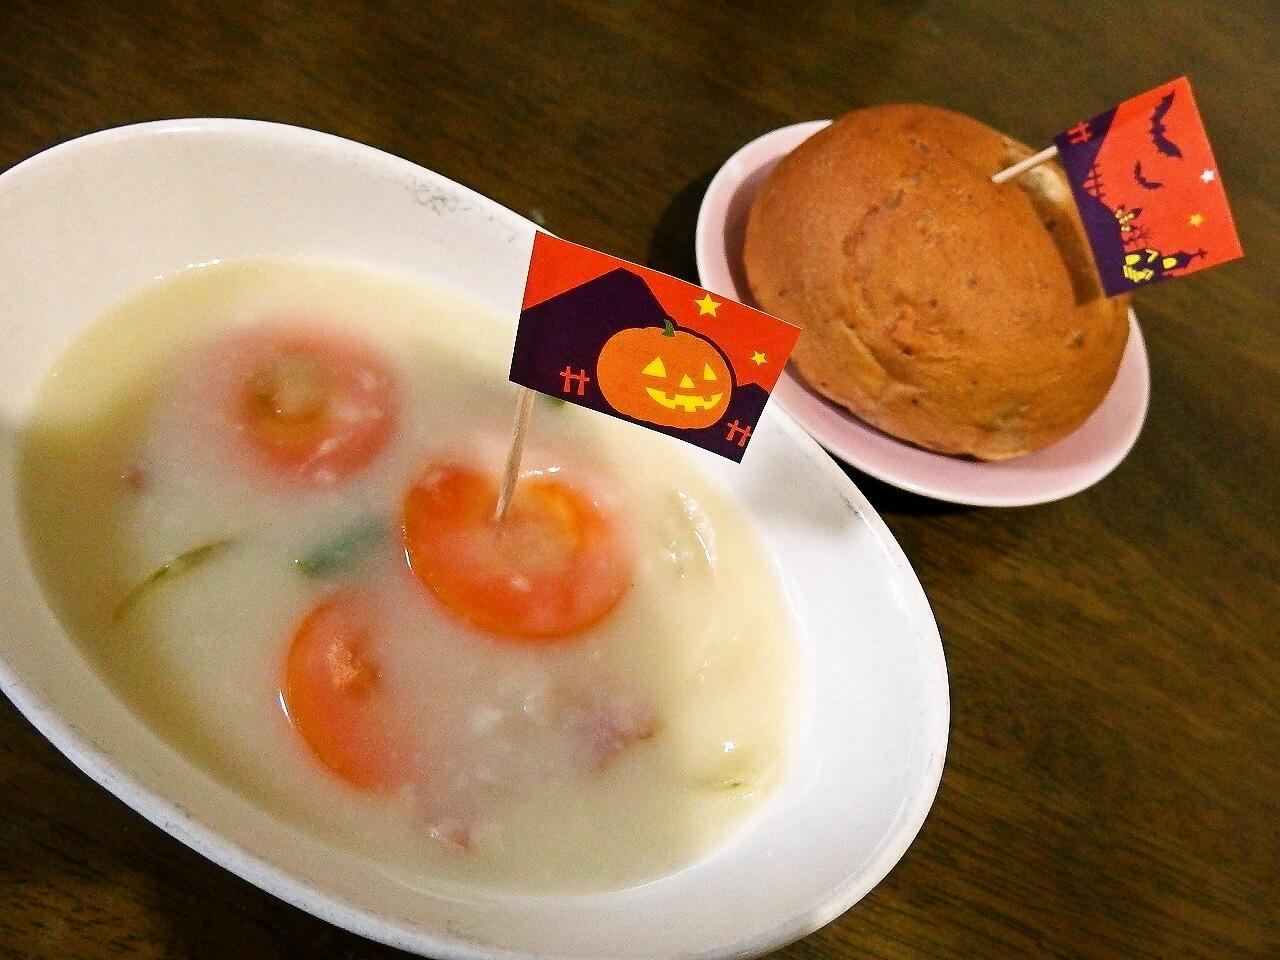 foodpic6493377.jpg